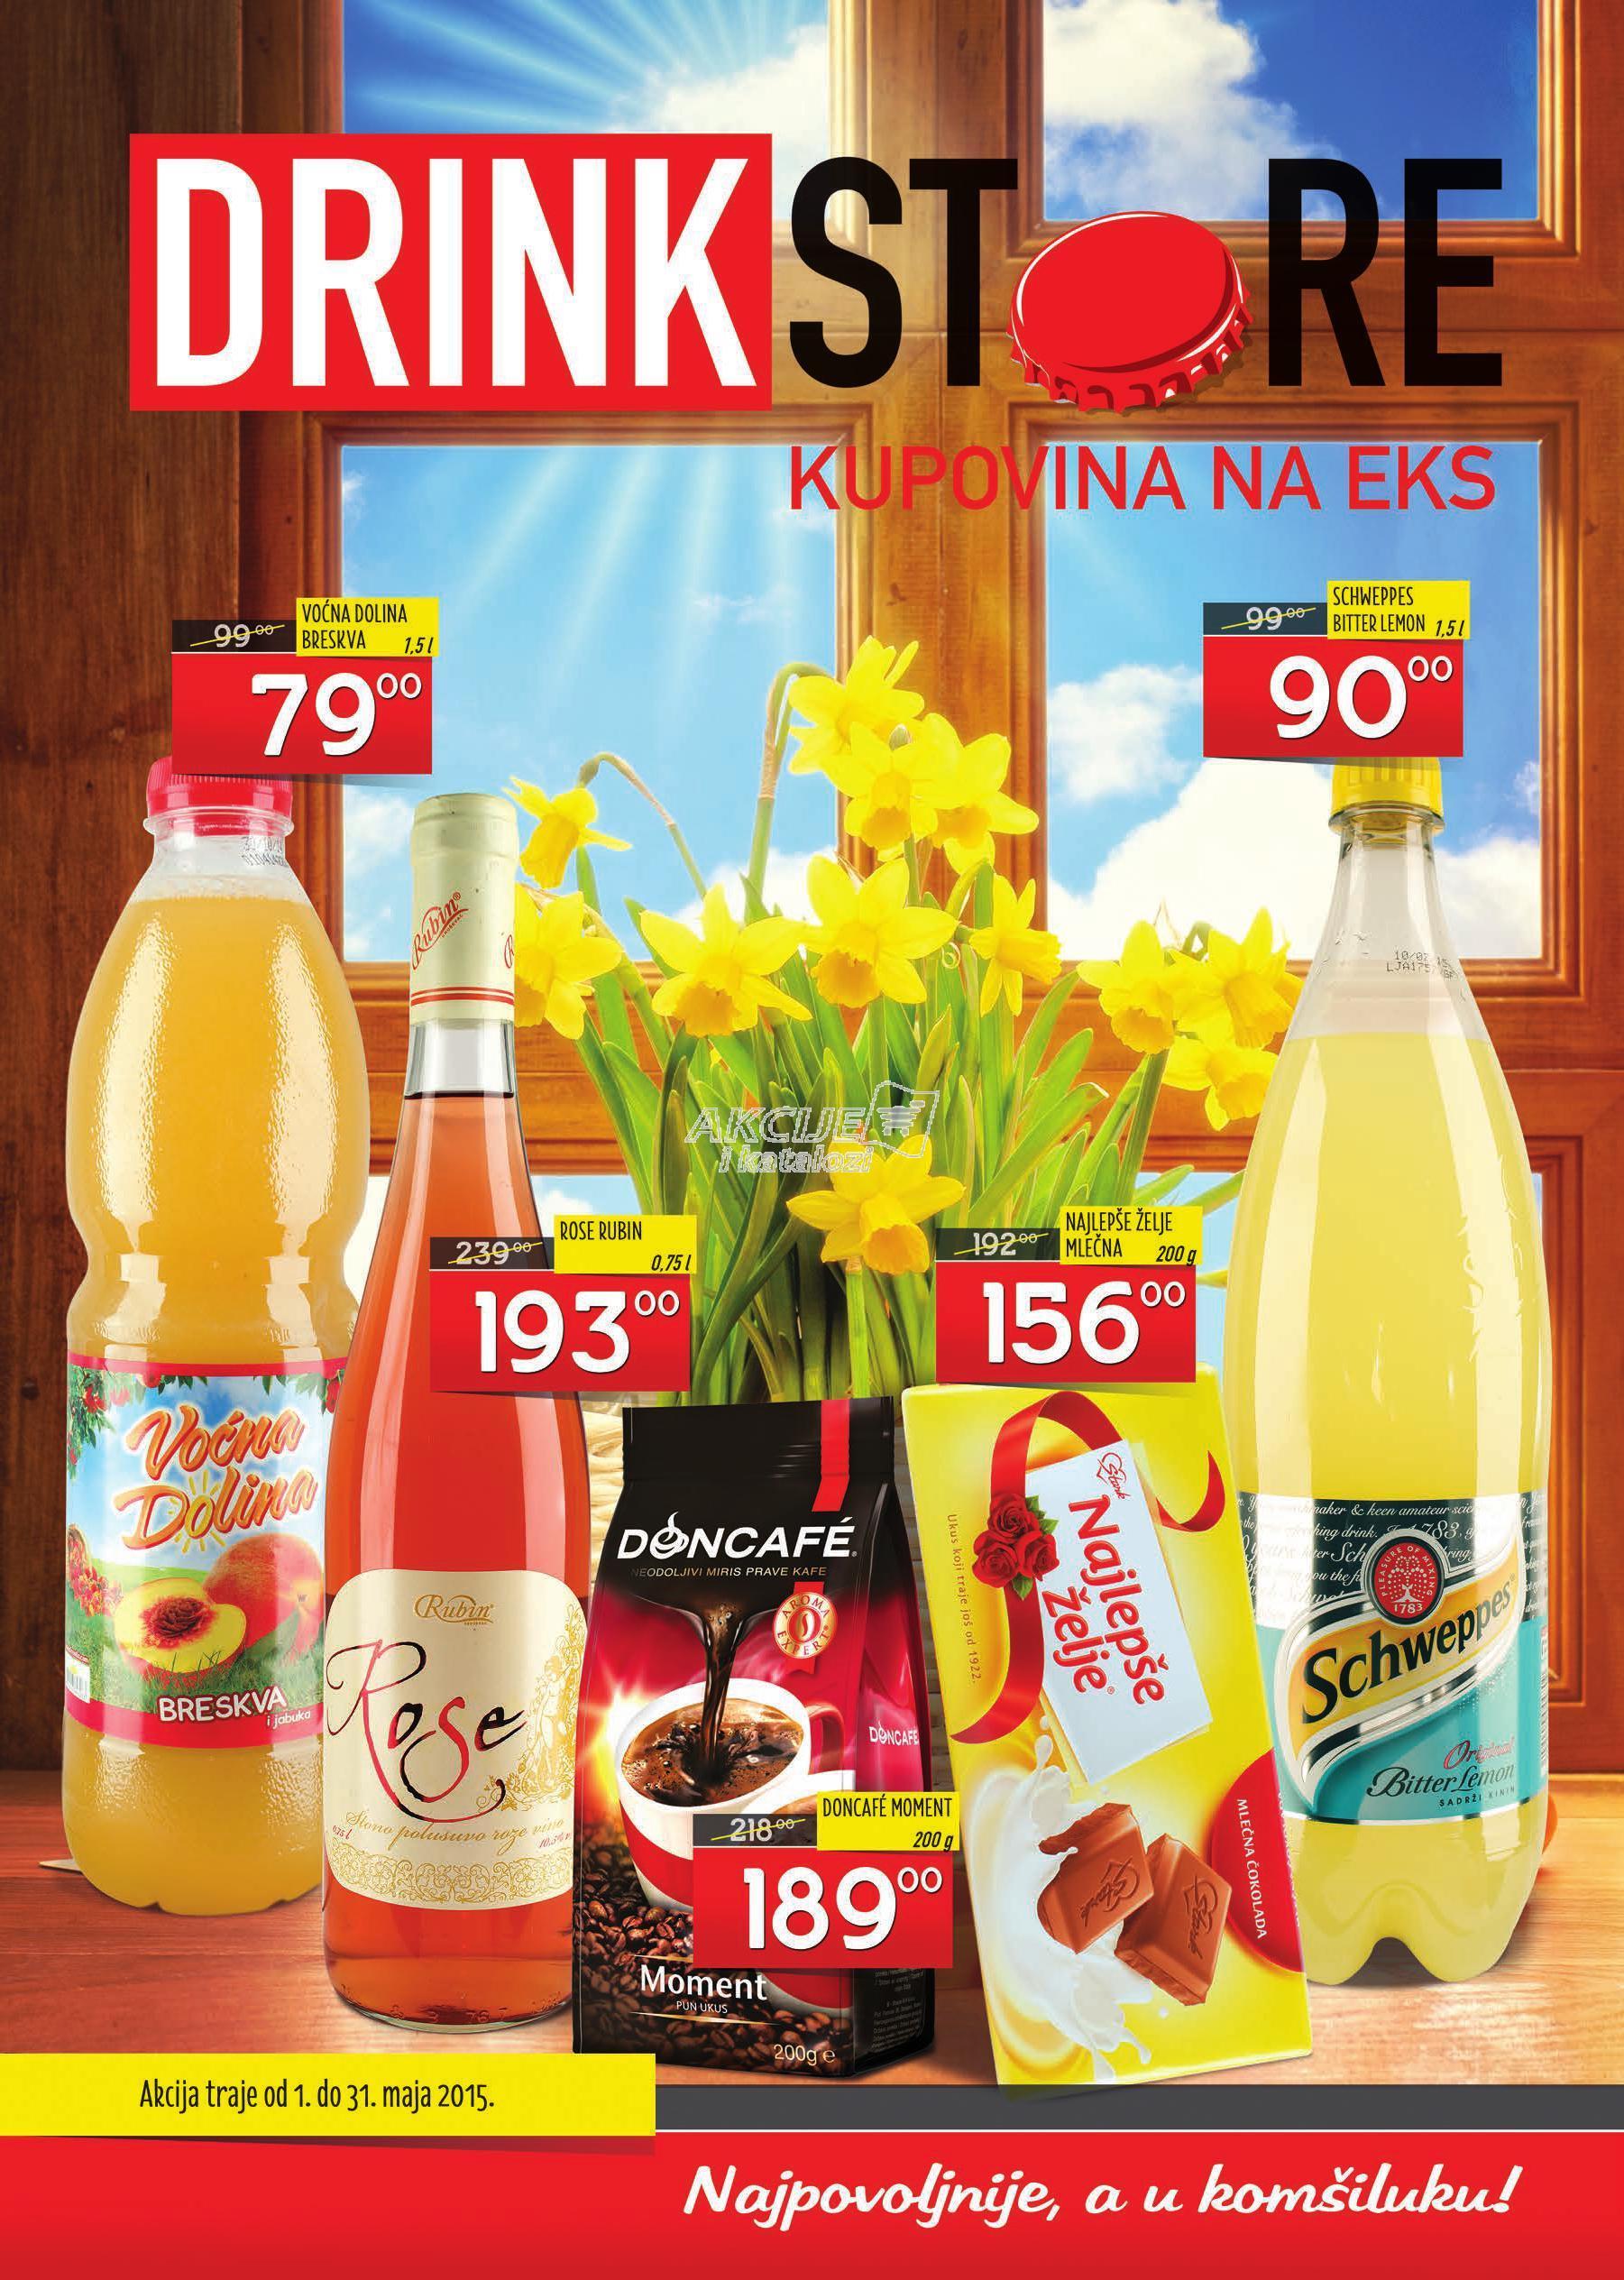 Drink Store - Redovna akcija majske ponude